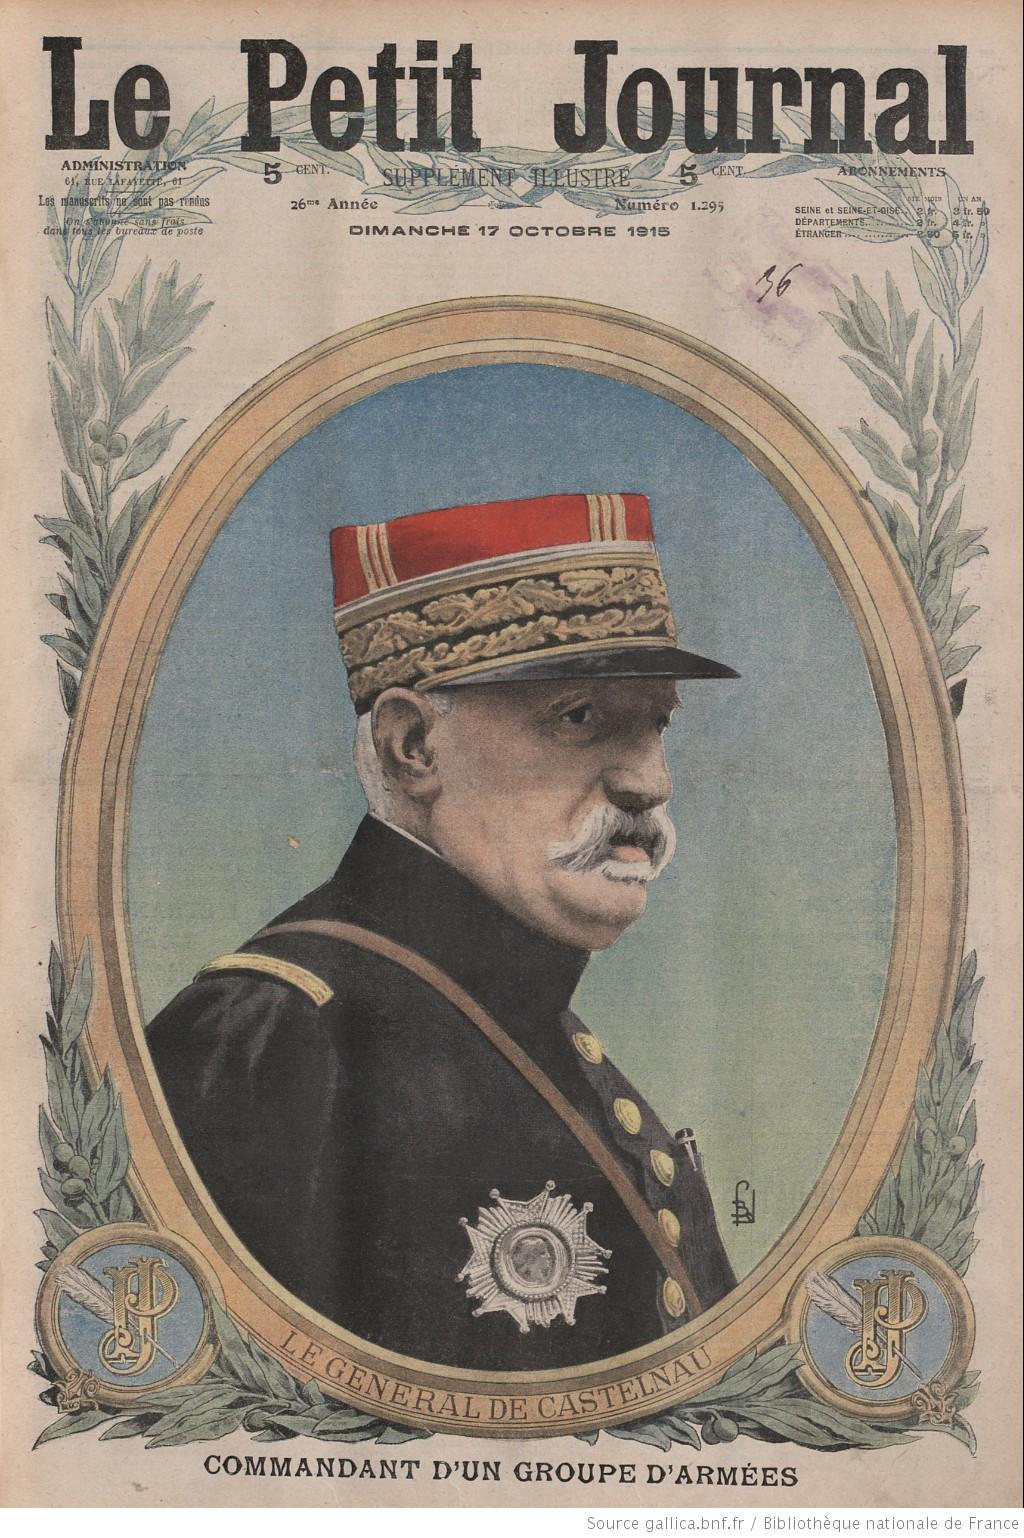 LPJ Illustre 1915-10-17 A.jpg